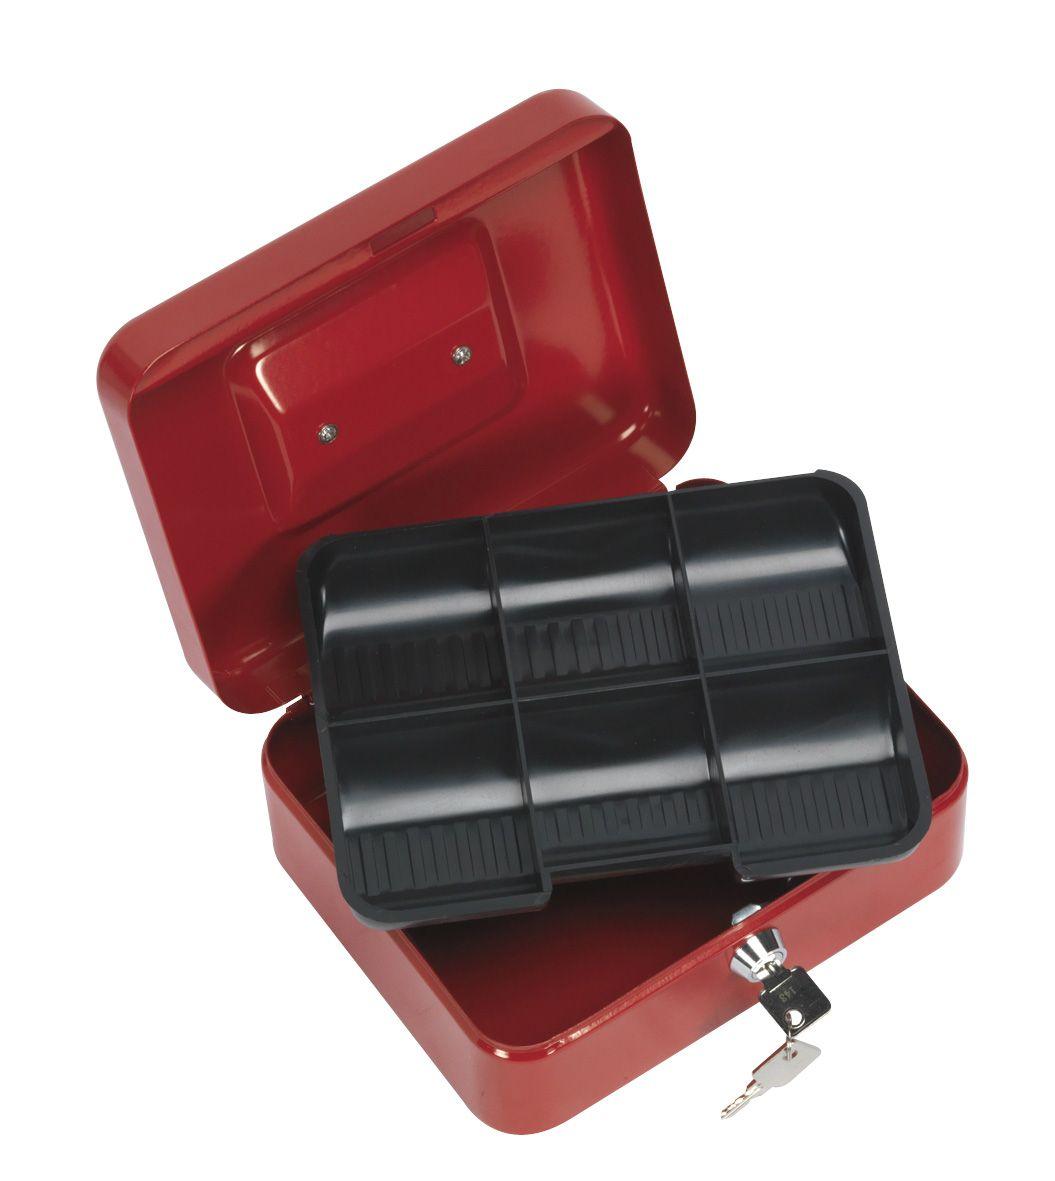 Sealey Key Lock Cash Box 200 x 160 x 90mm